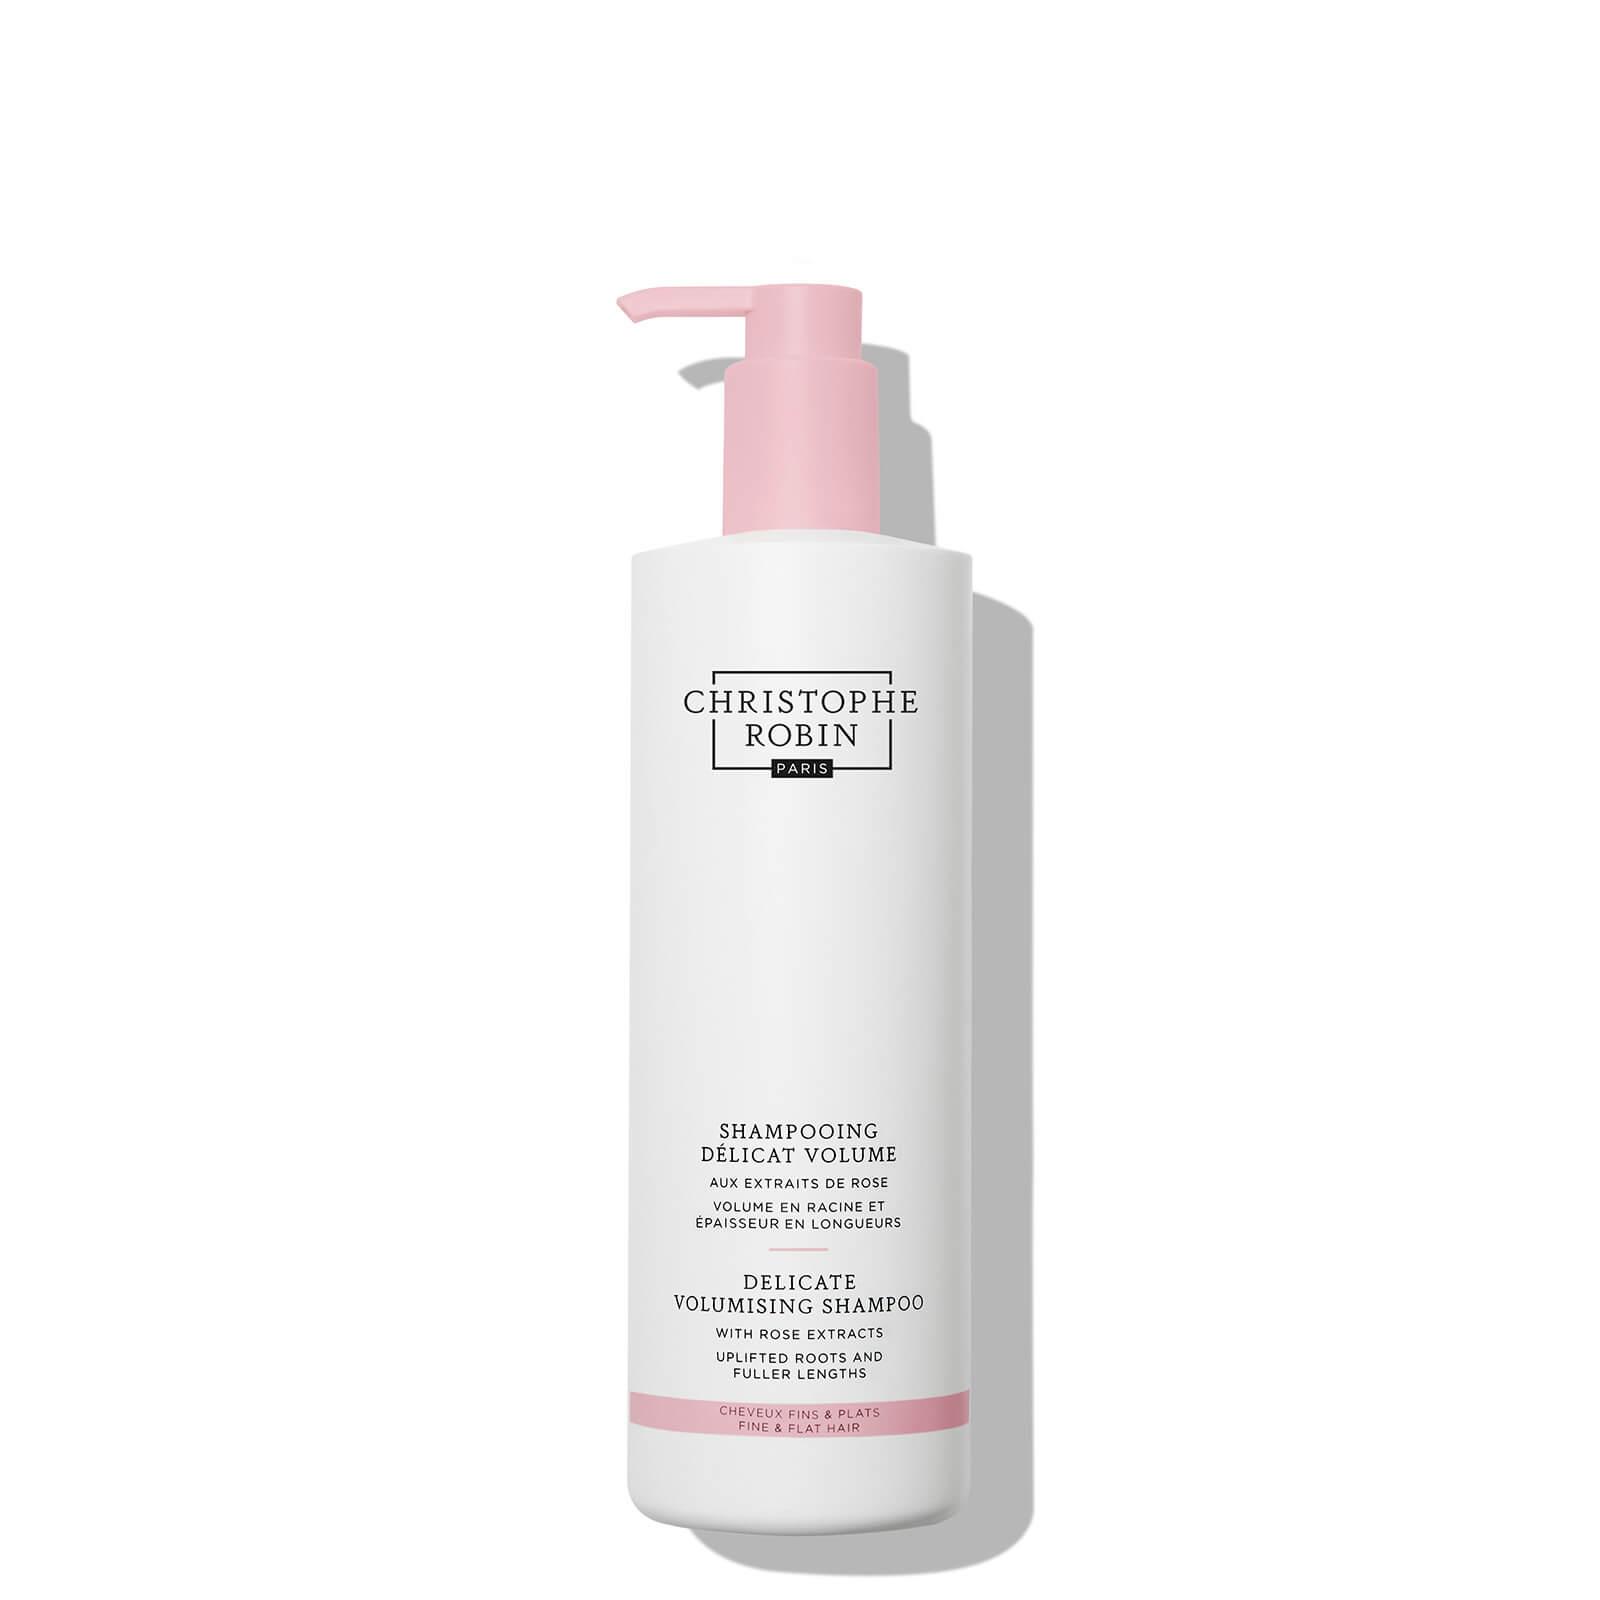 Купить Christophe Robin Delicate Volumising Shampoo with Rose Extracts 500ml